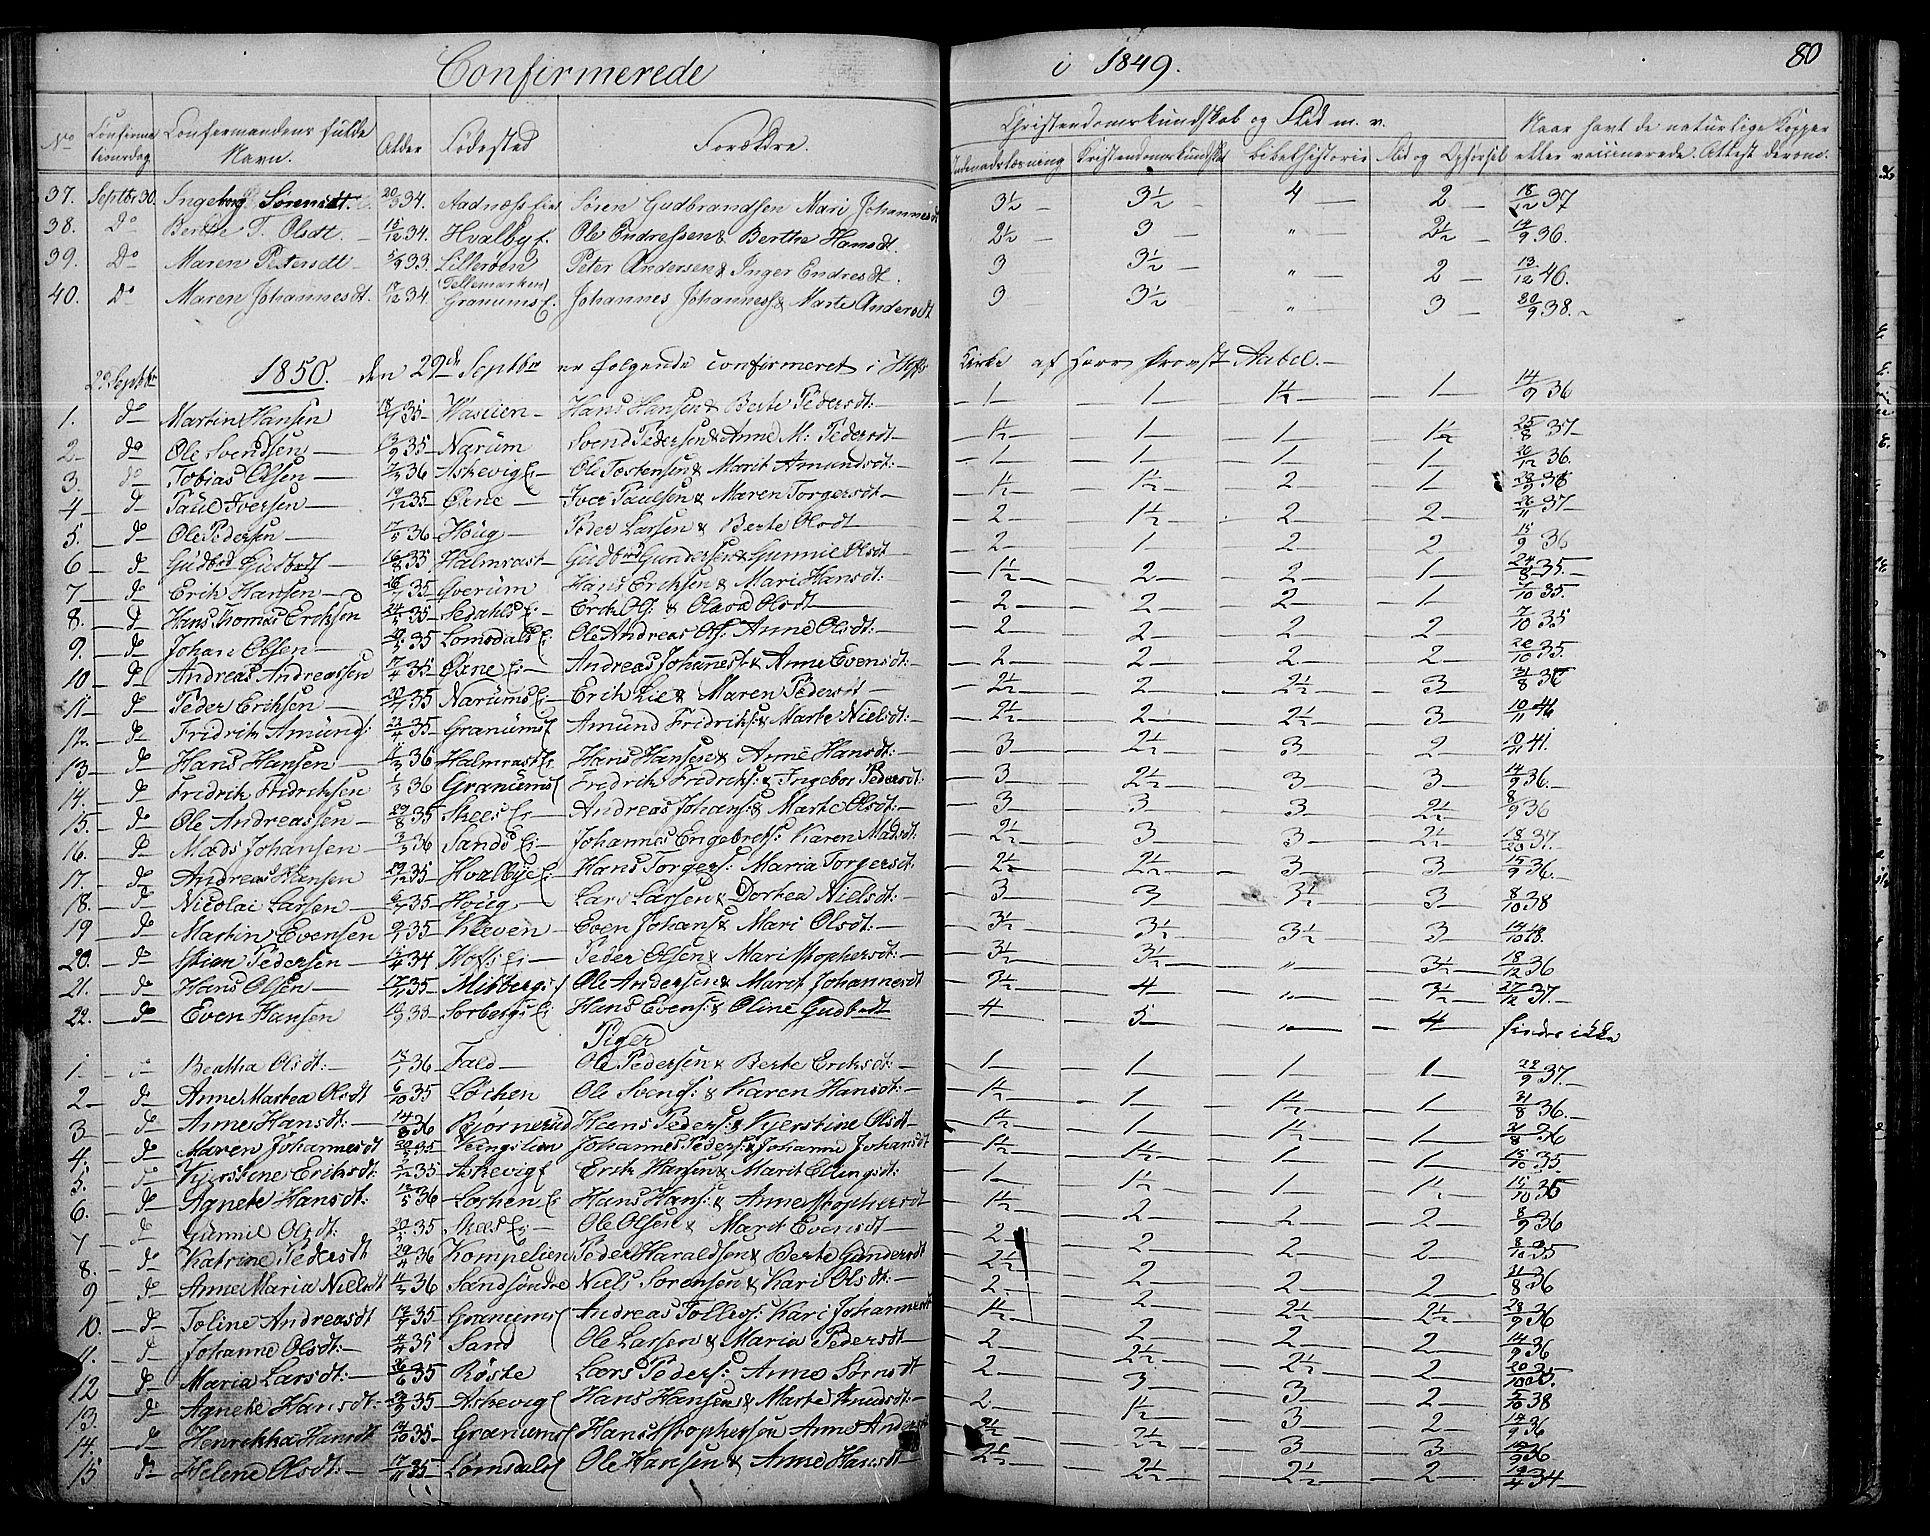 SAH, Søndre Land prestekontor, L/L0001: Klokkerbok nr. 1, 1849-1883, s. 80